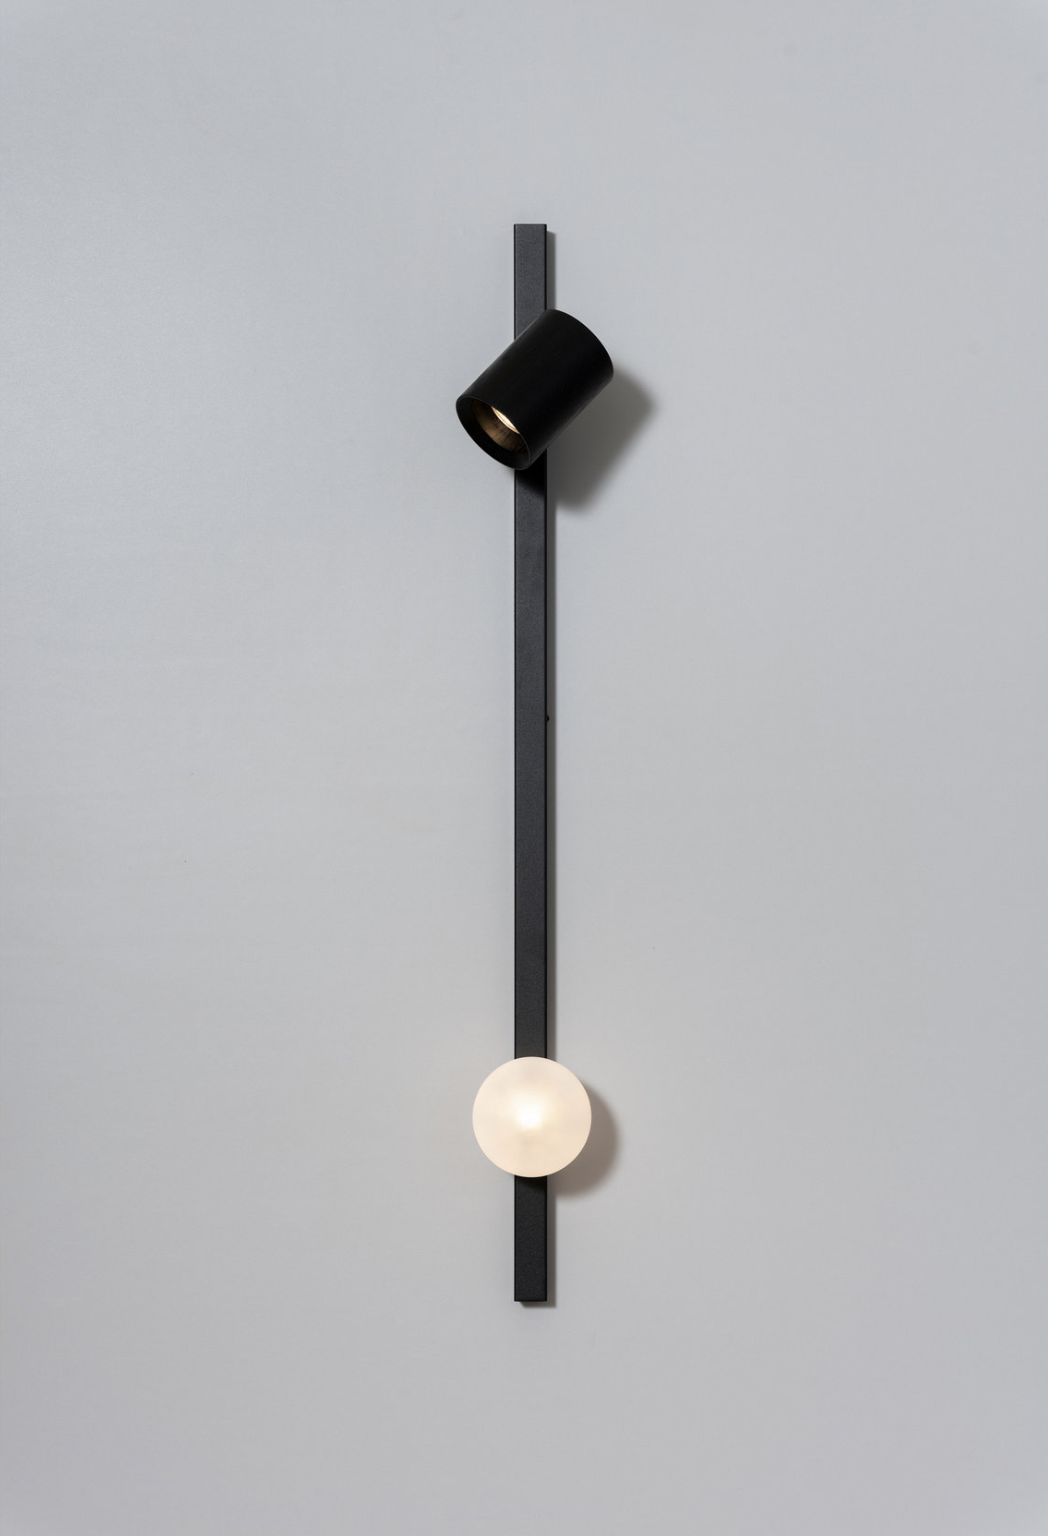 Maison et Objet 2020, minimal wall light by Asaf Weinbroom